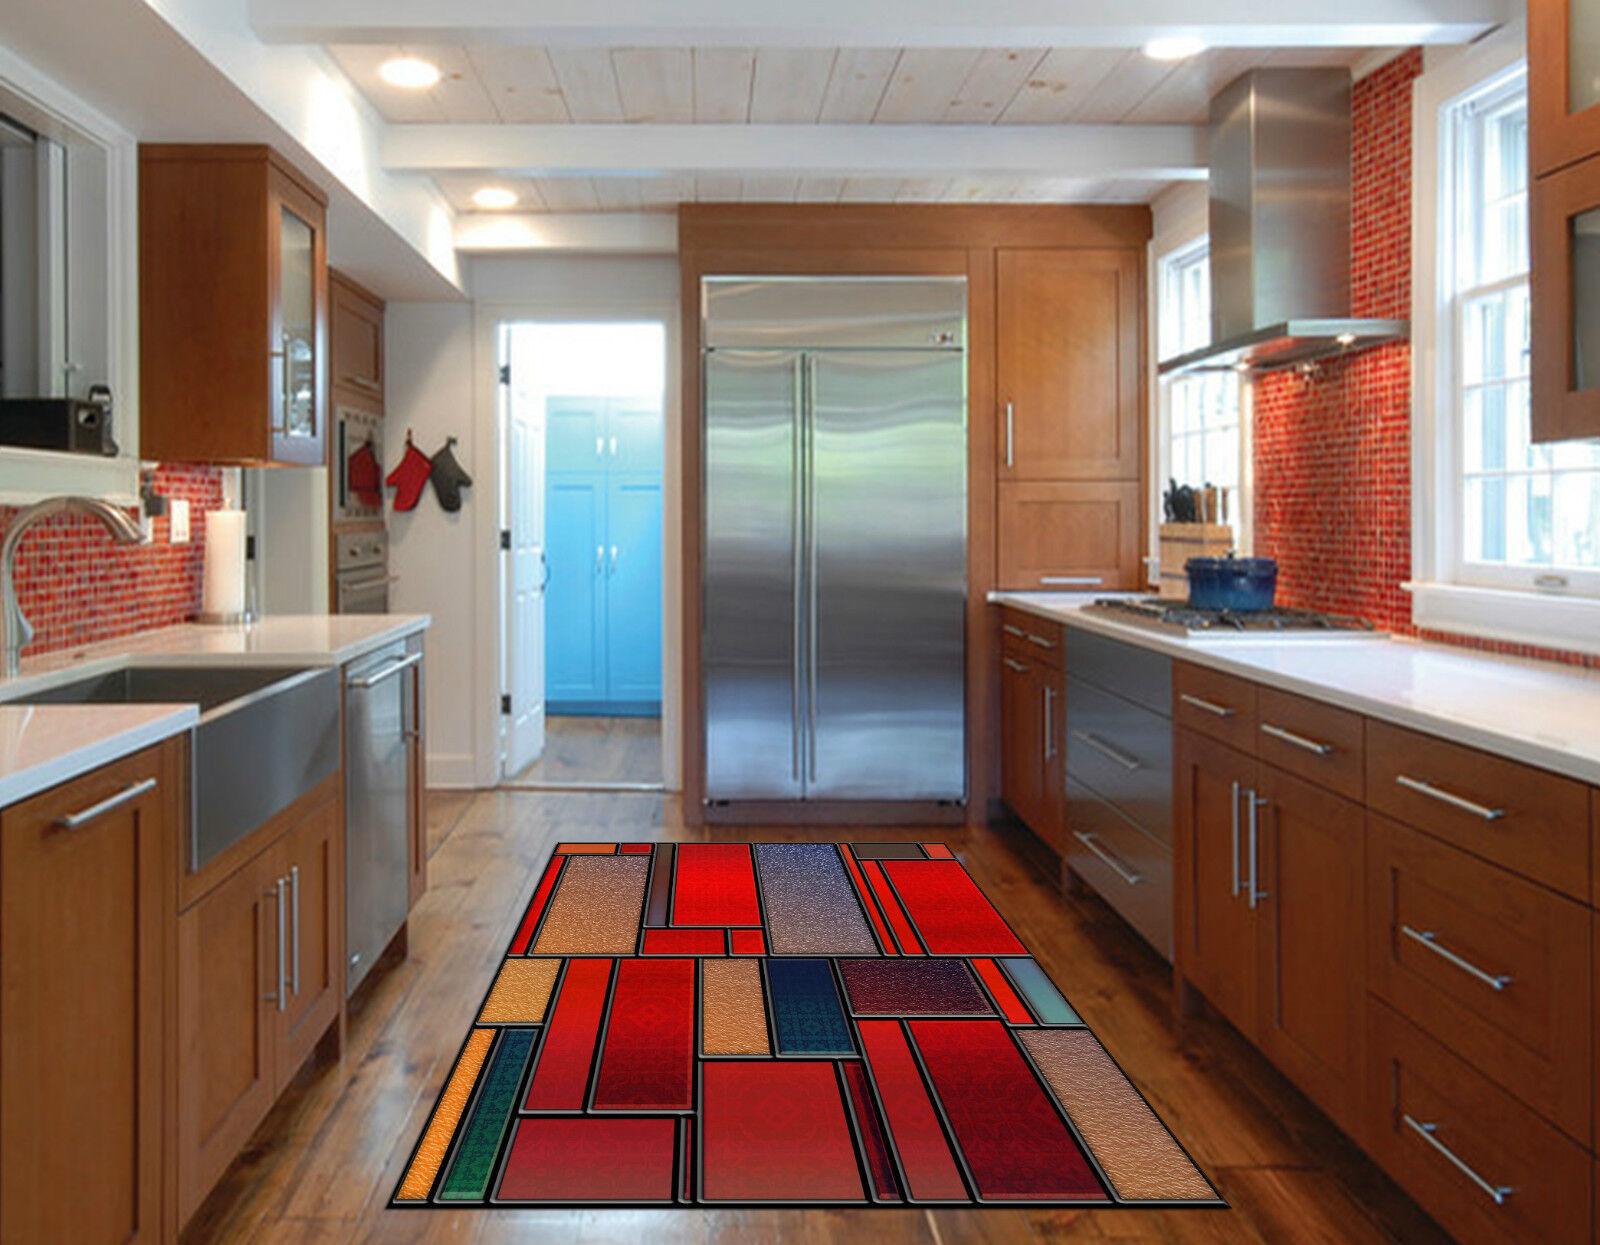 3D Plaid Patterns Kitchen Mat Floor Murals Wall Print Wall Deco AJ WALLPAPER CA